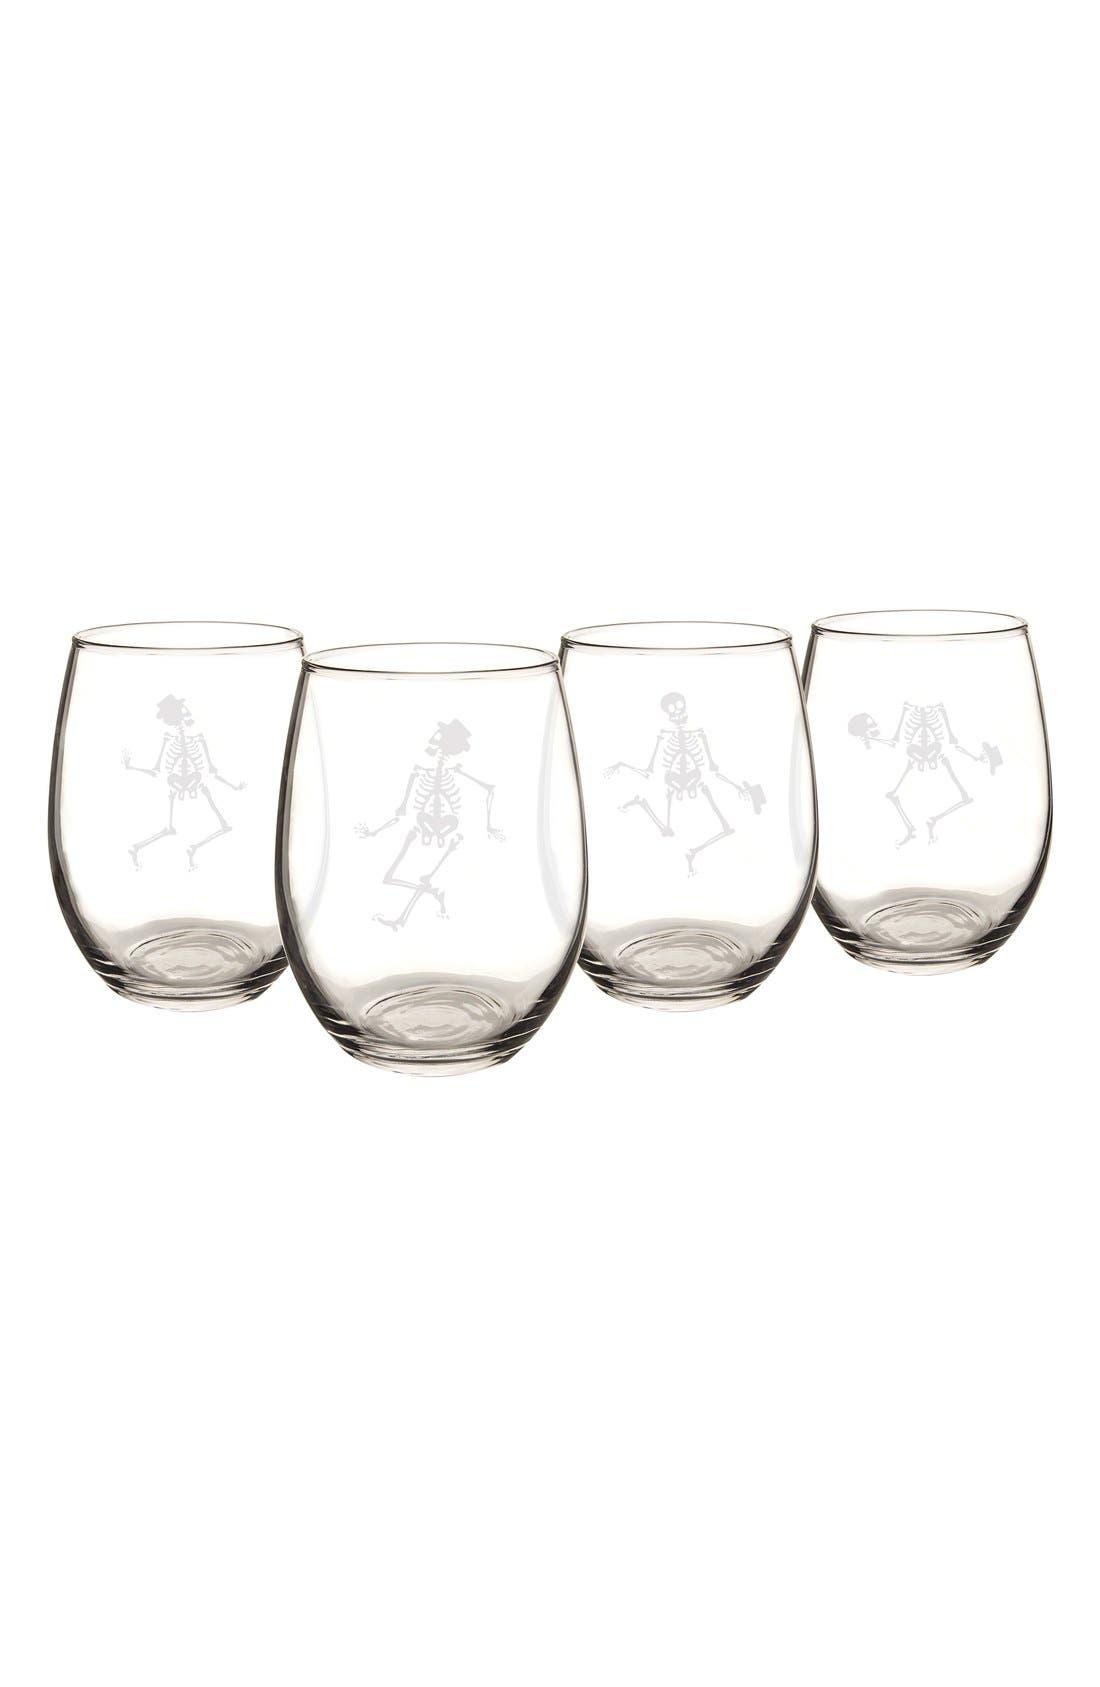 Skeletons Set of 4 Stemless Wine Glasses,                             Alternate thumbnail 2, color,                             Clear